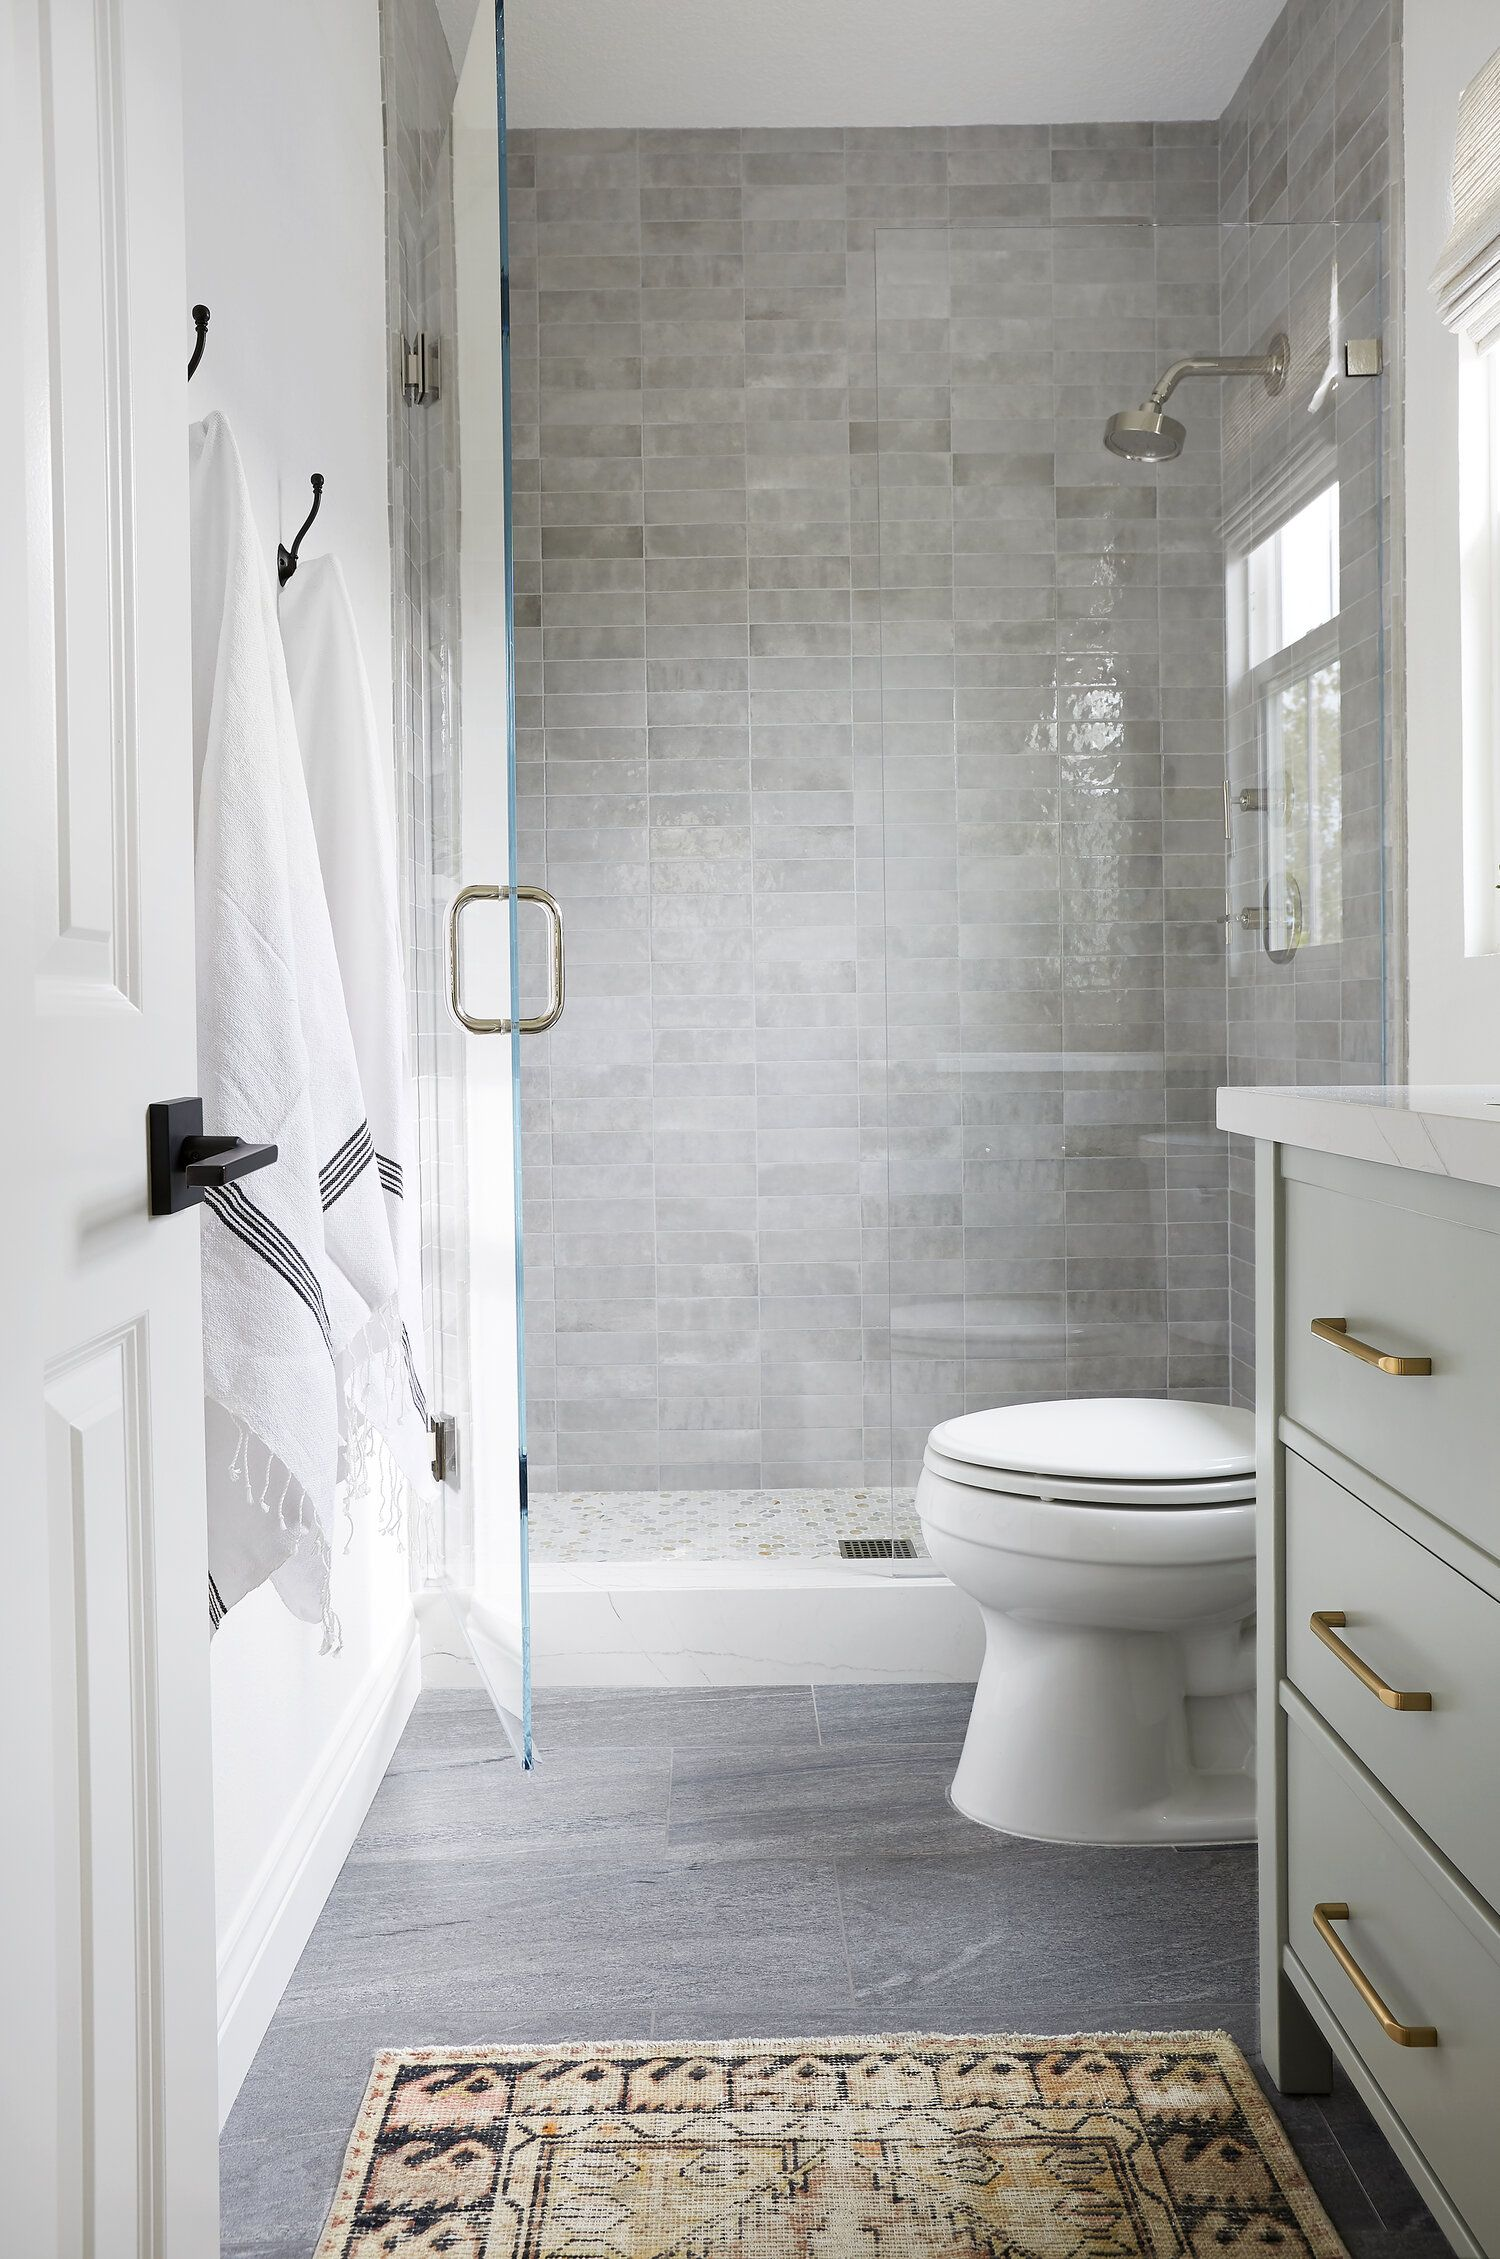 Pretty Neutral Bathroom Design By Los Angeles Interior Designer Lindsey Brooke Design Jpg In 2020 Bath Remodel Guest Bathroom Neutral Bathrooms Designs